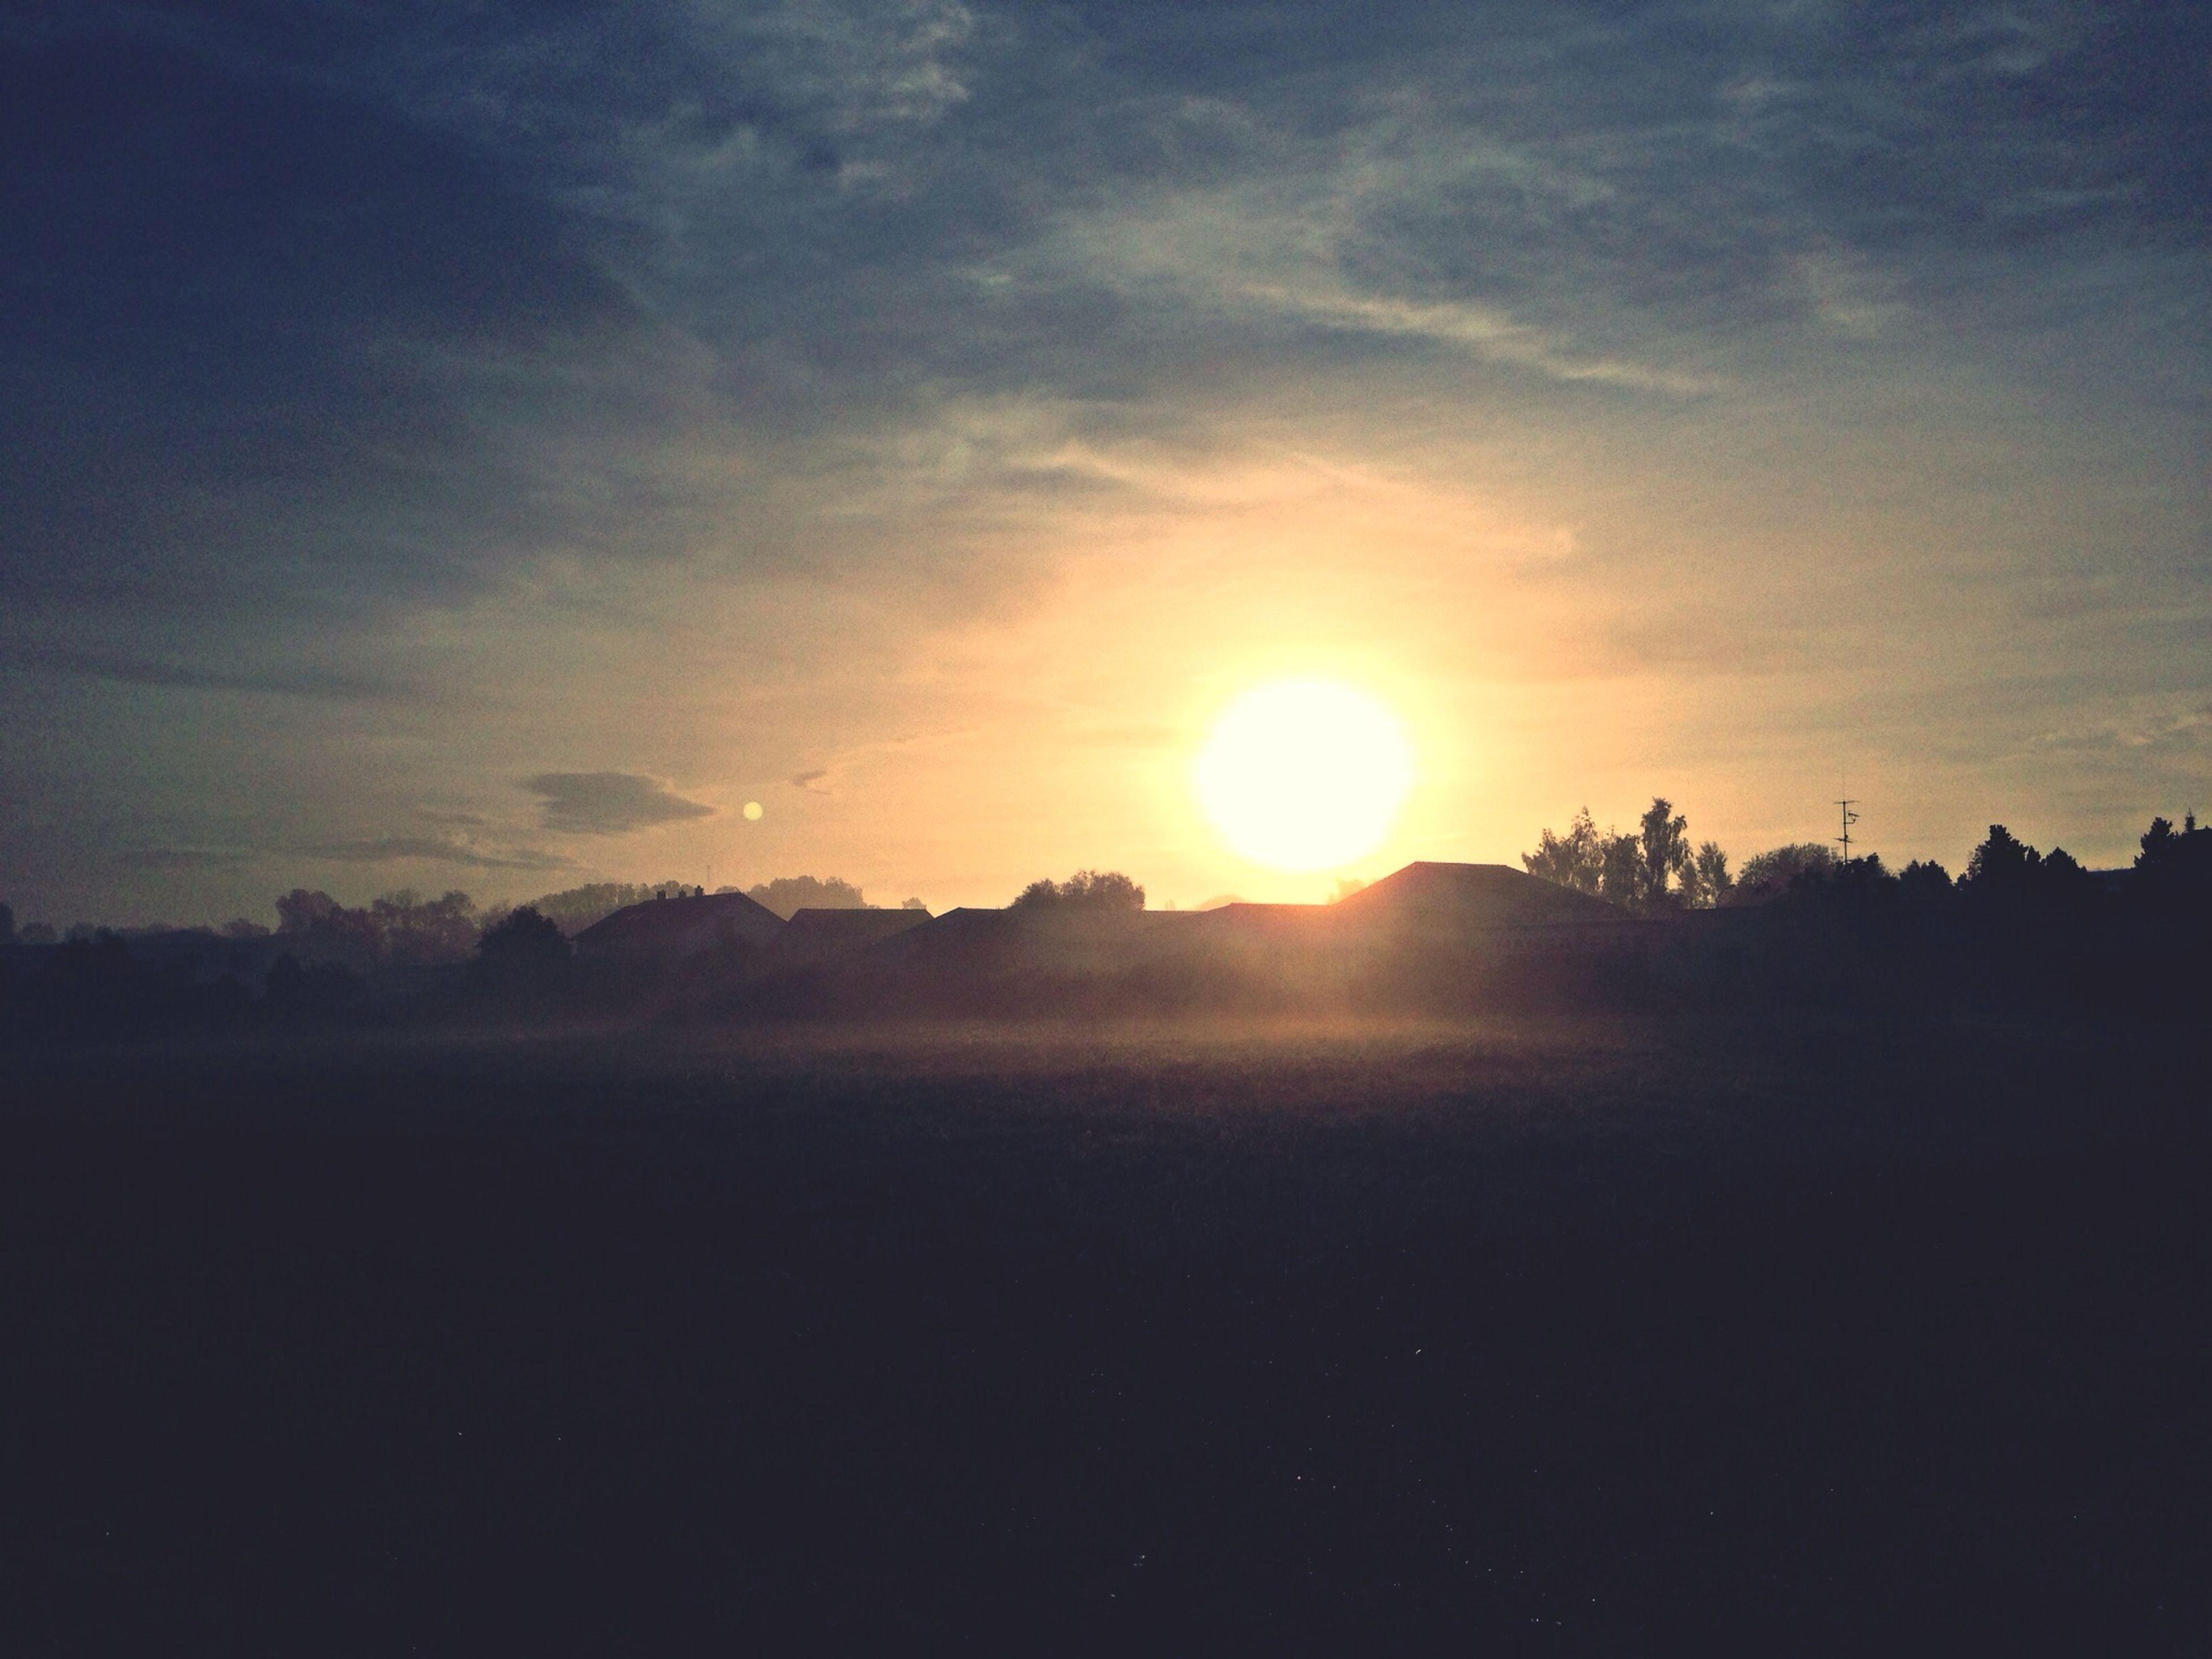 sun, sunset, tranquil scene, tranquility, scenics, beauty in nature, sky, silhouette, sunlight, sunbeam, nature, landscape, idyllic, lens flare, tree, cloud - sky, orange color, non-urban scene, outdoors, no people